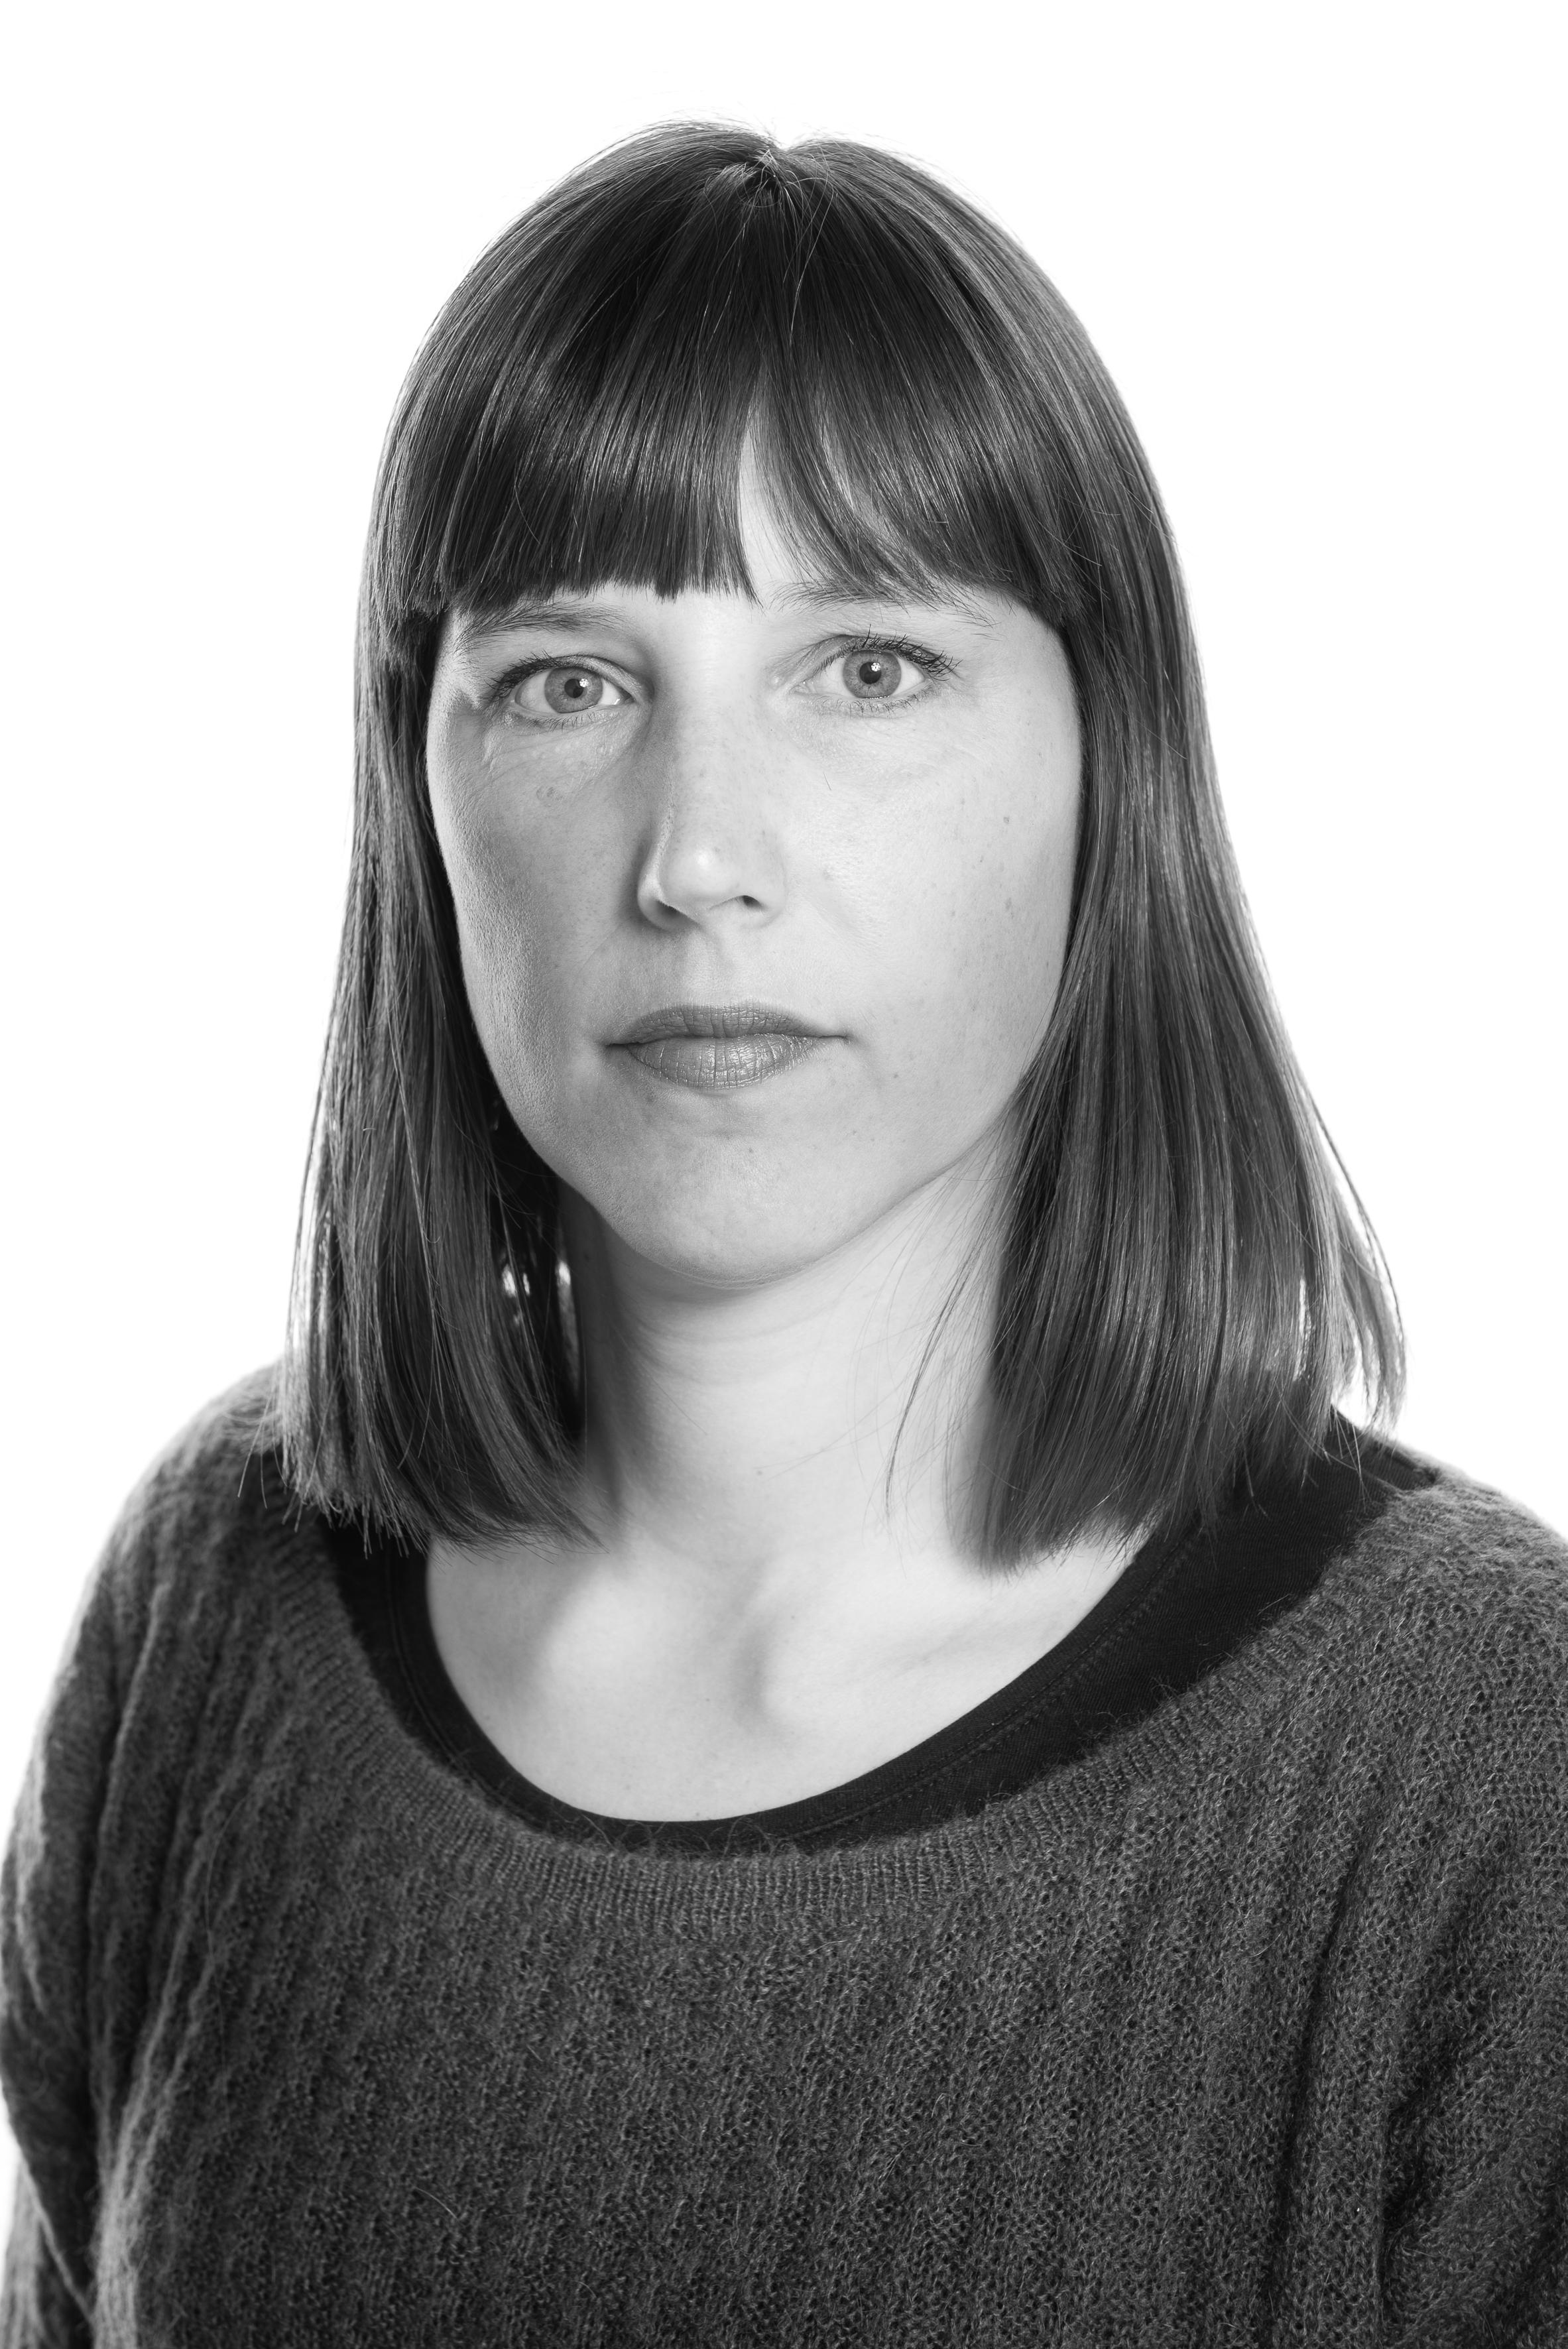 mariapetersson-sv-portratt